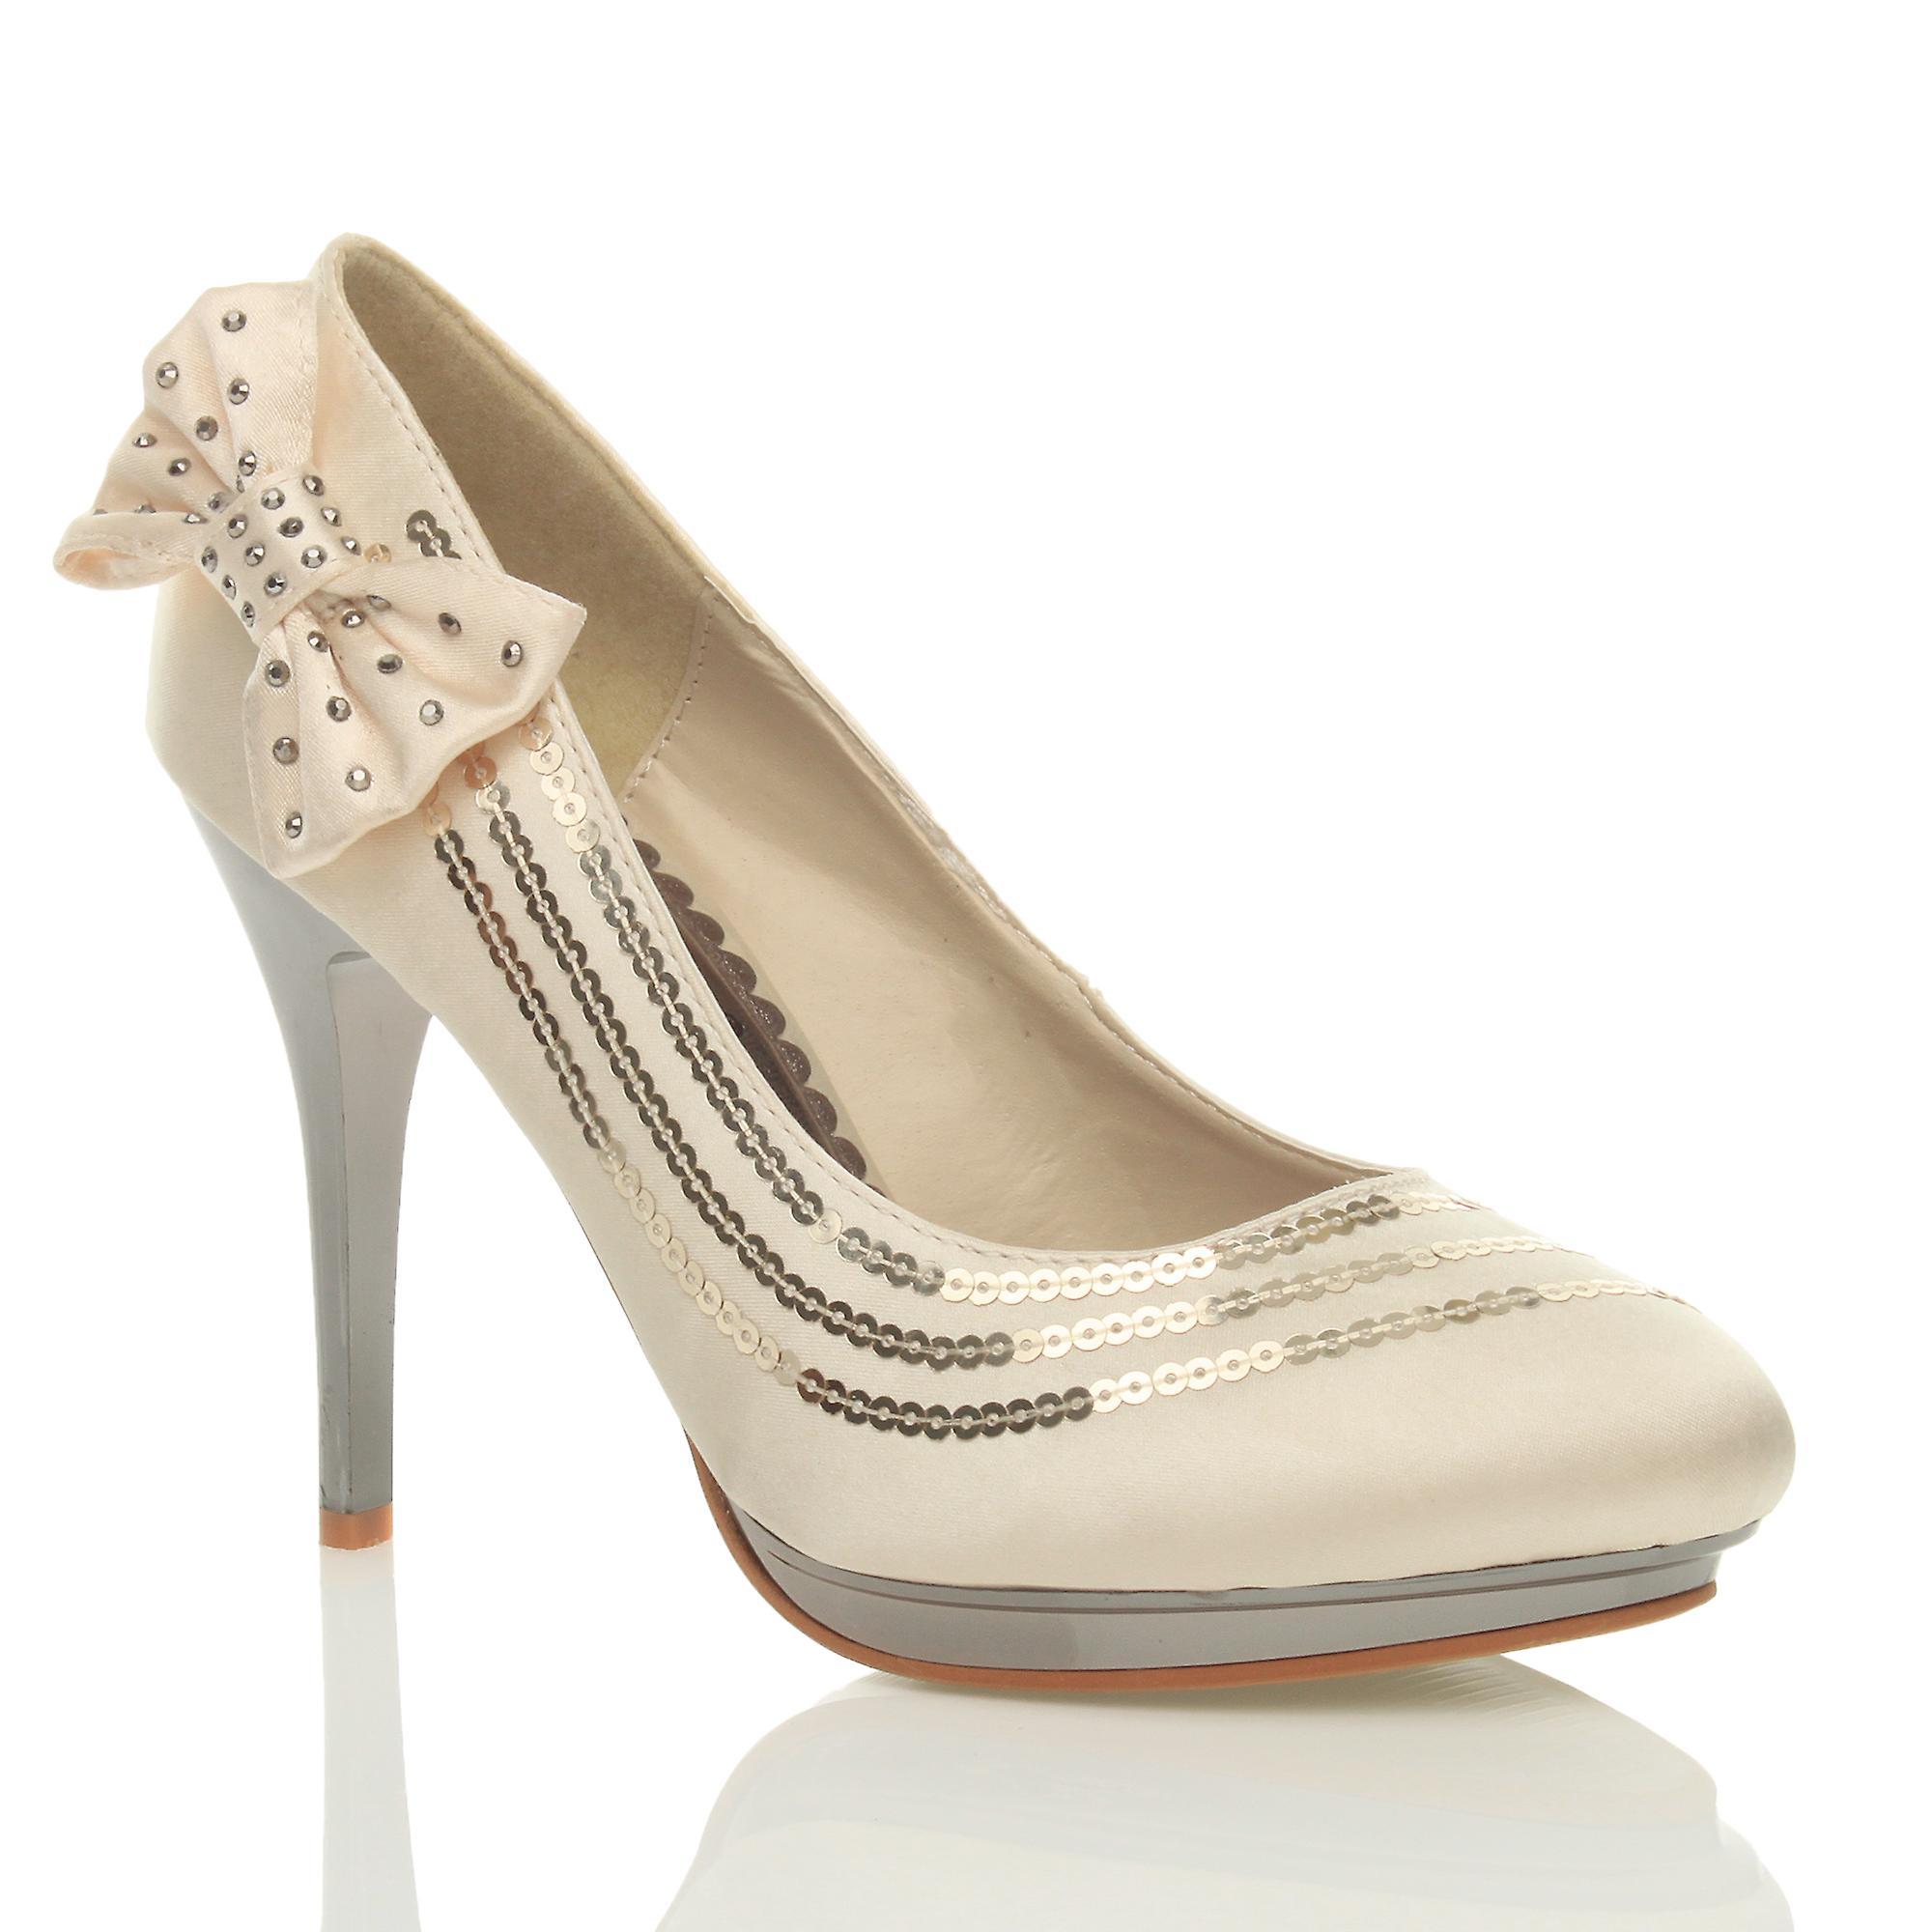 Ajvani womens high heel sequin bow diamante wedding evening party court shoes pumps